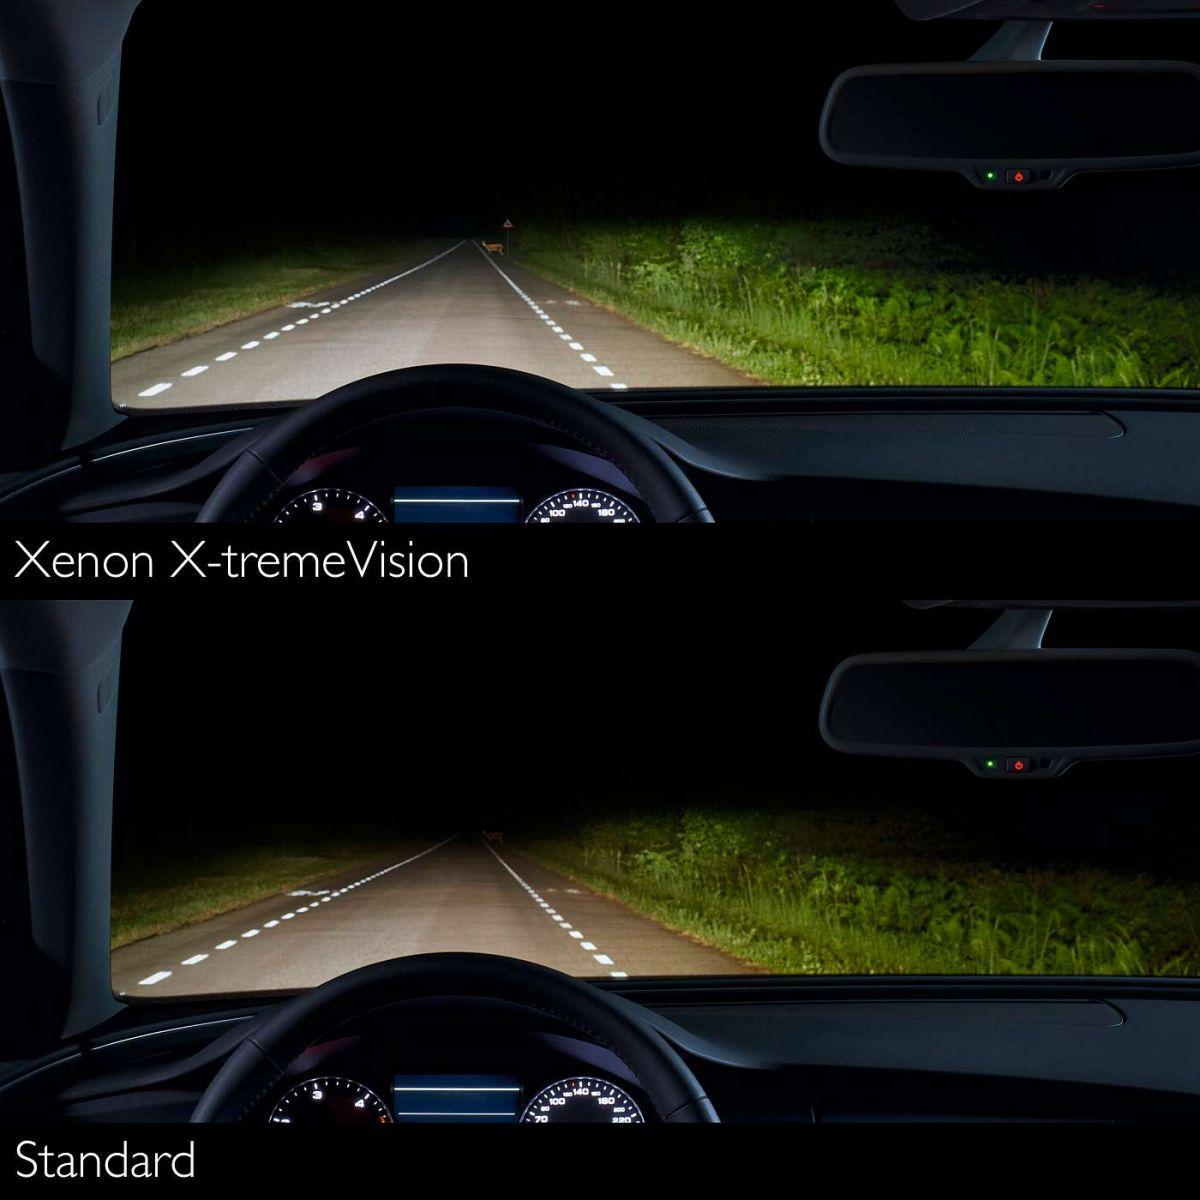 Philips Xenon X Treme Vision D1s Replacement Xenon Bulb